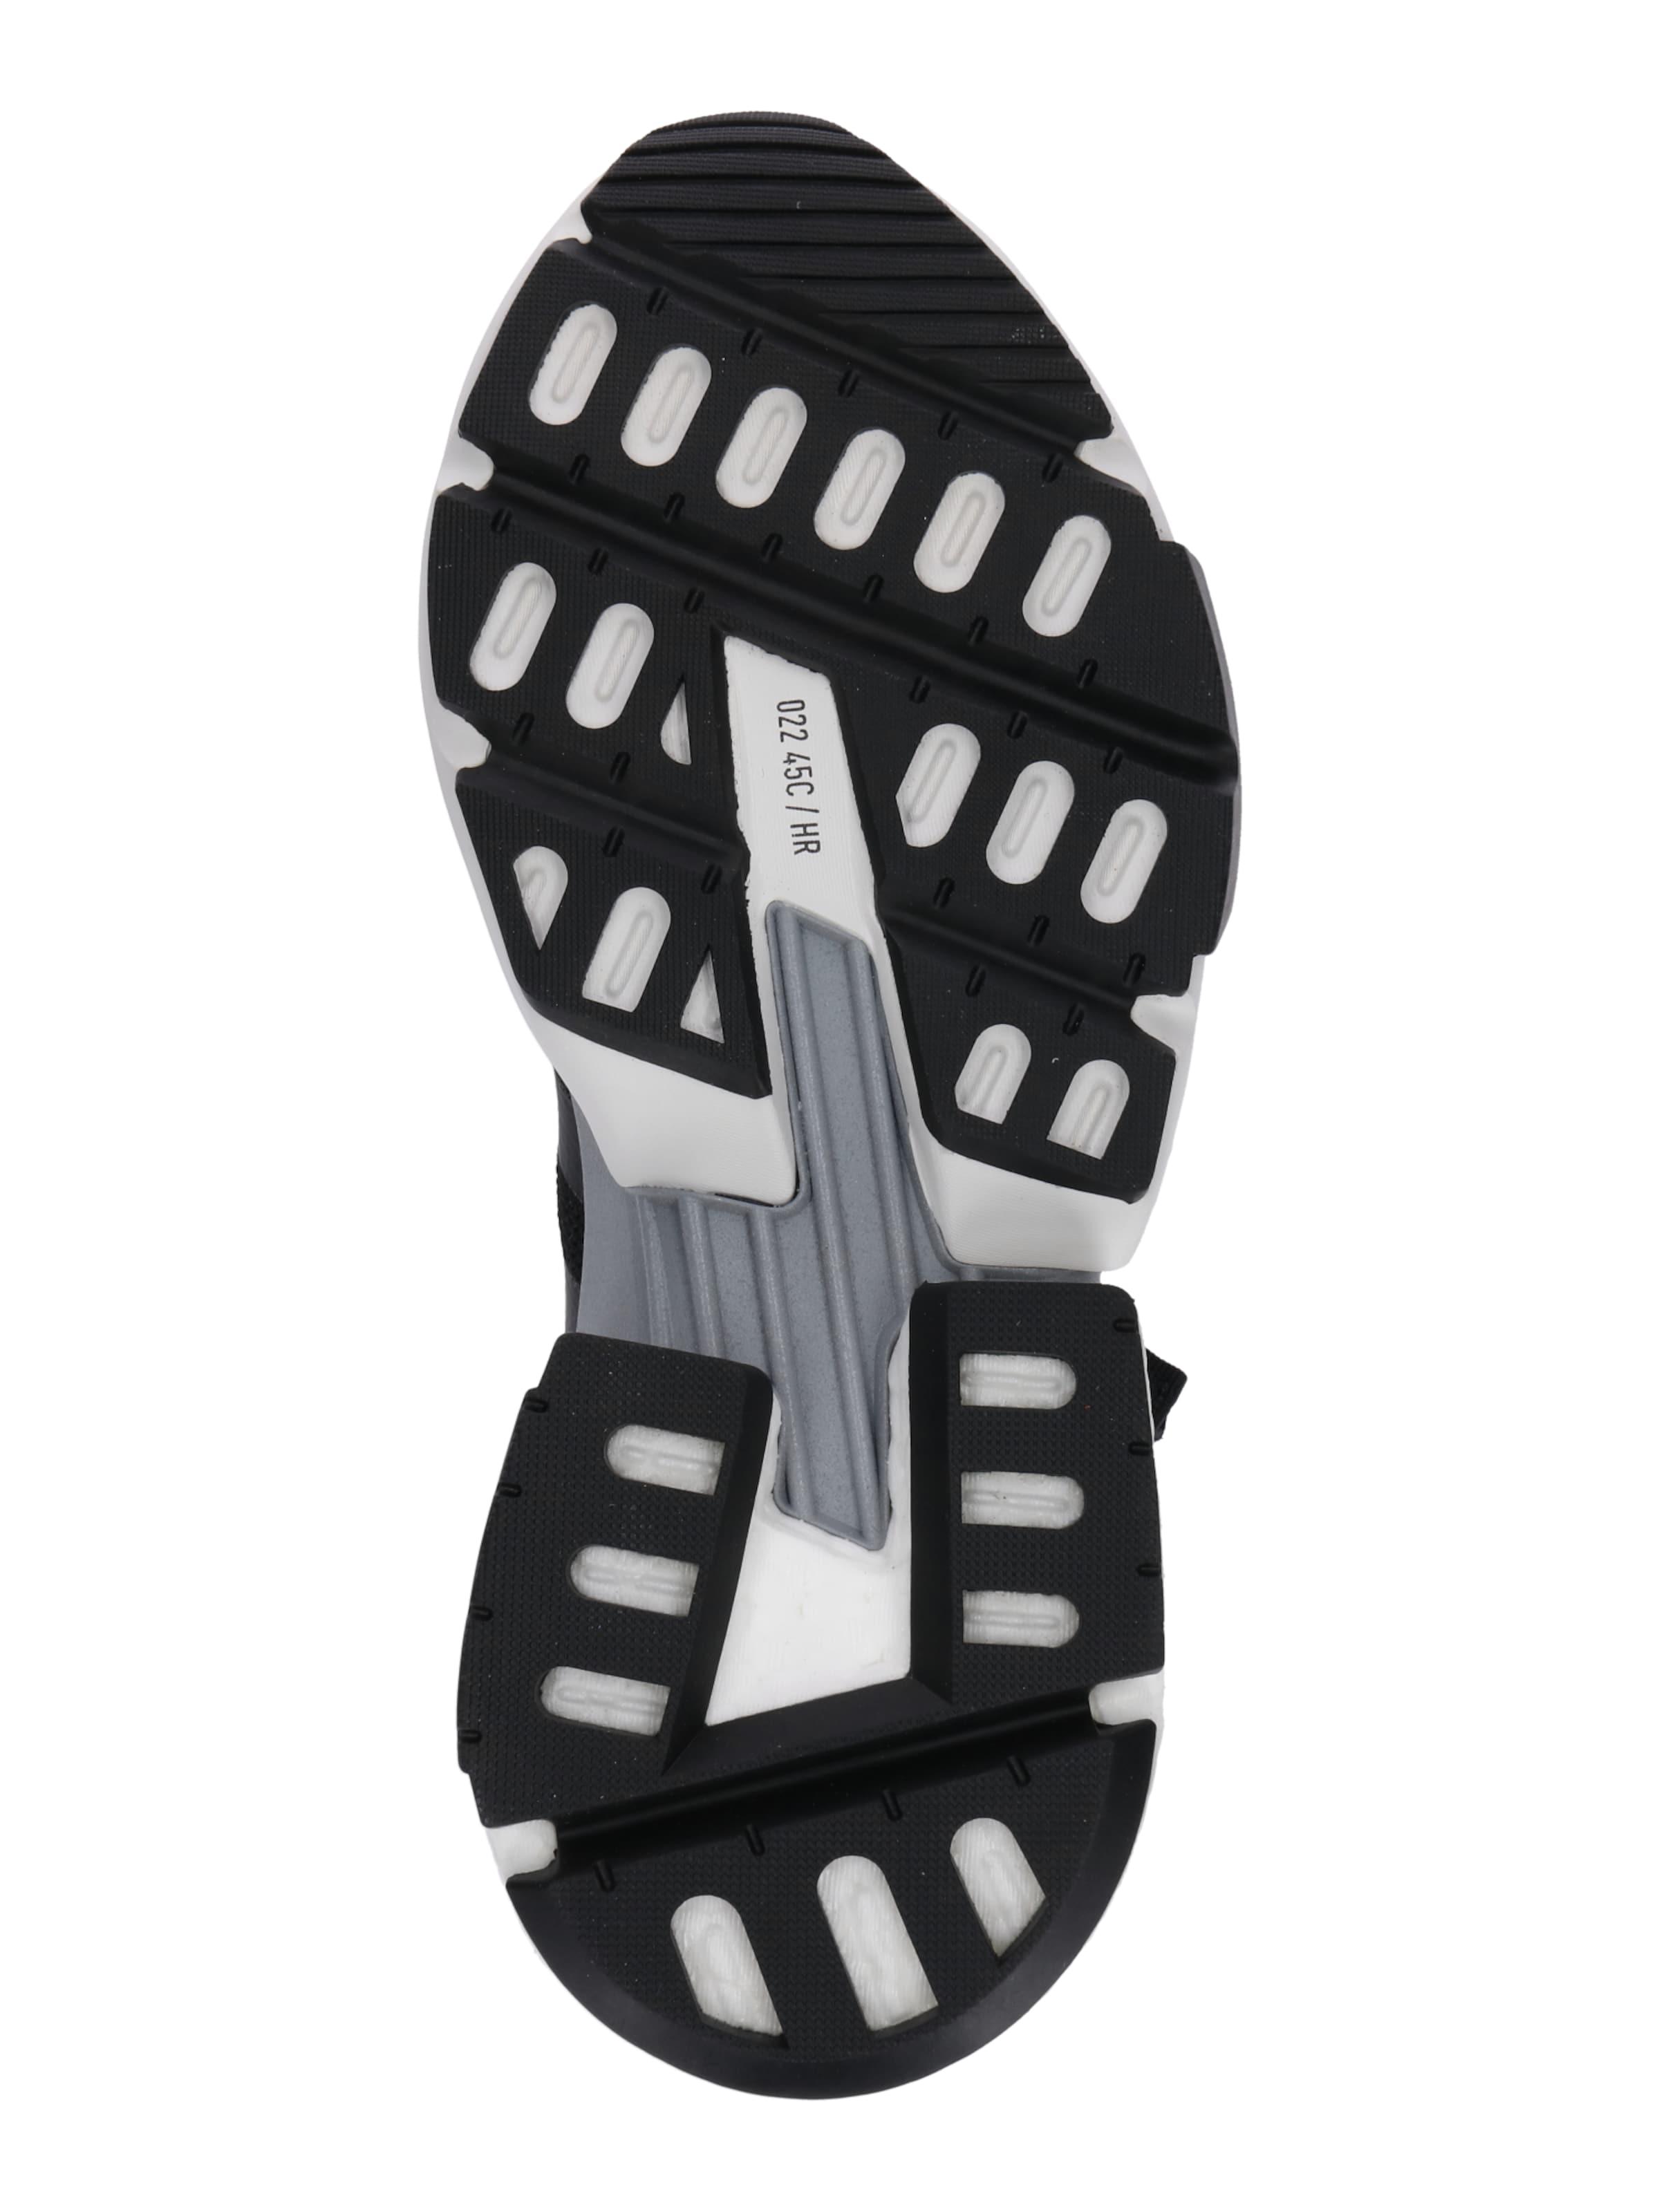 1' Adidas Baskets En NoirArgent Basses s3 Originals 'pod WY2IDEH9